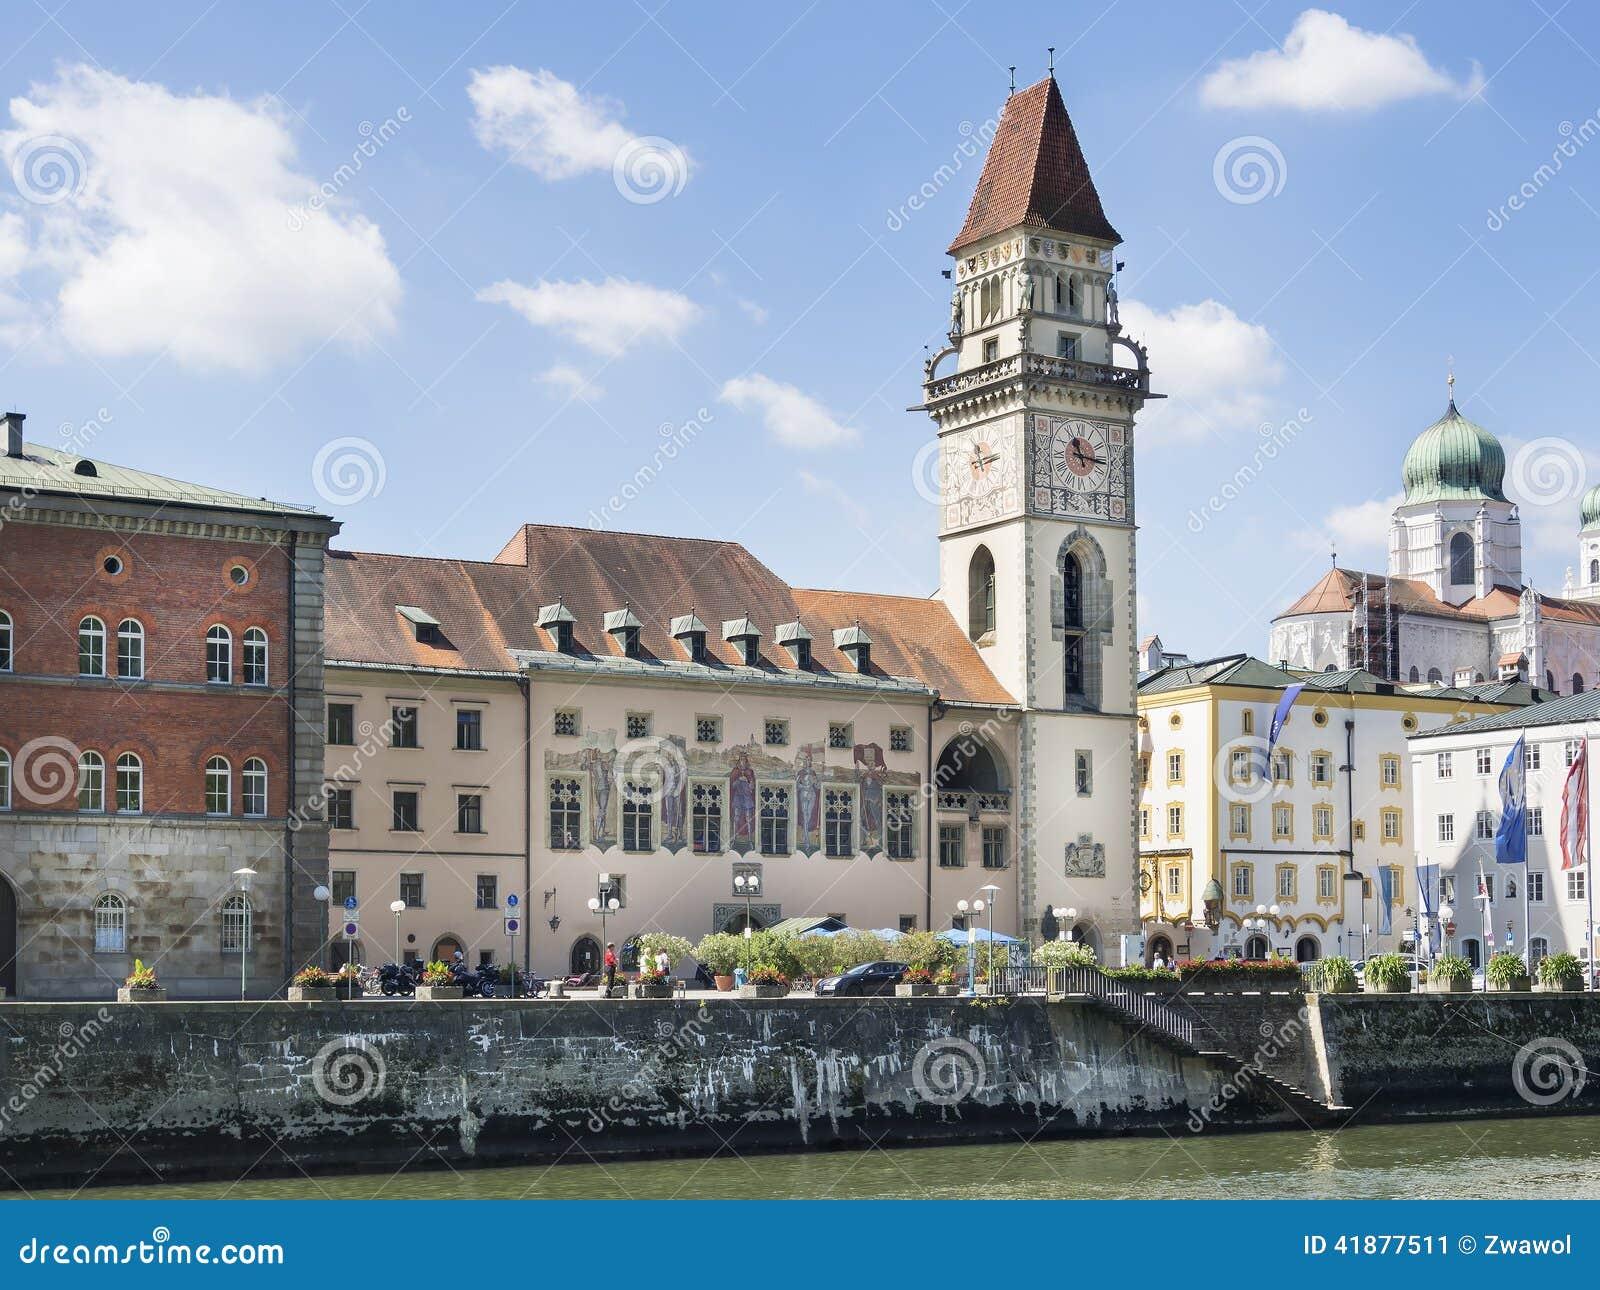 City Hall Passau